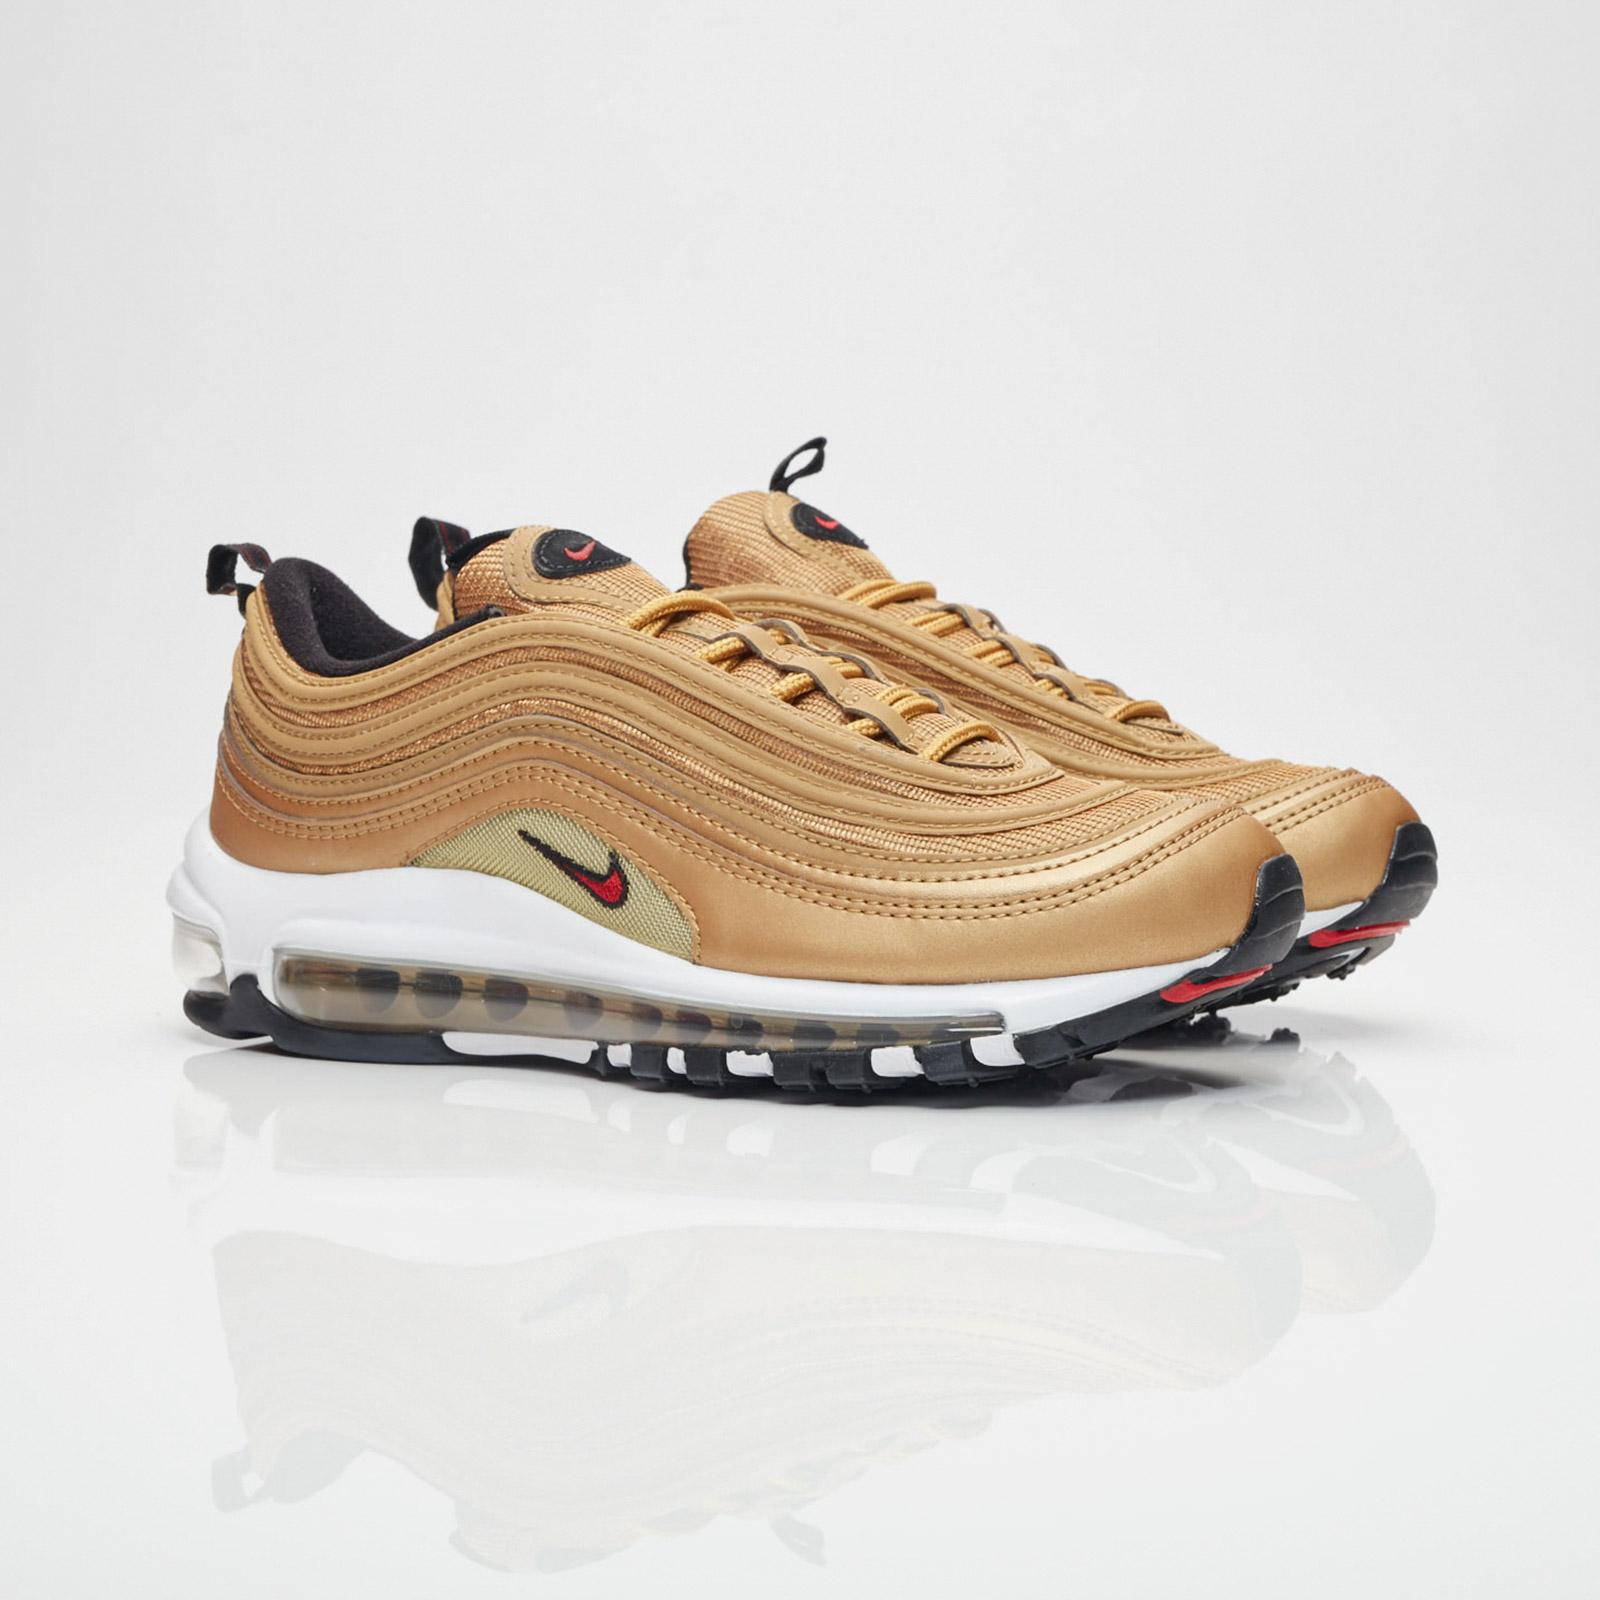 save off c4cd0 d666b Nike Sportswear Air Max 97 OG QS